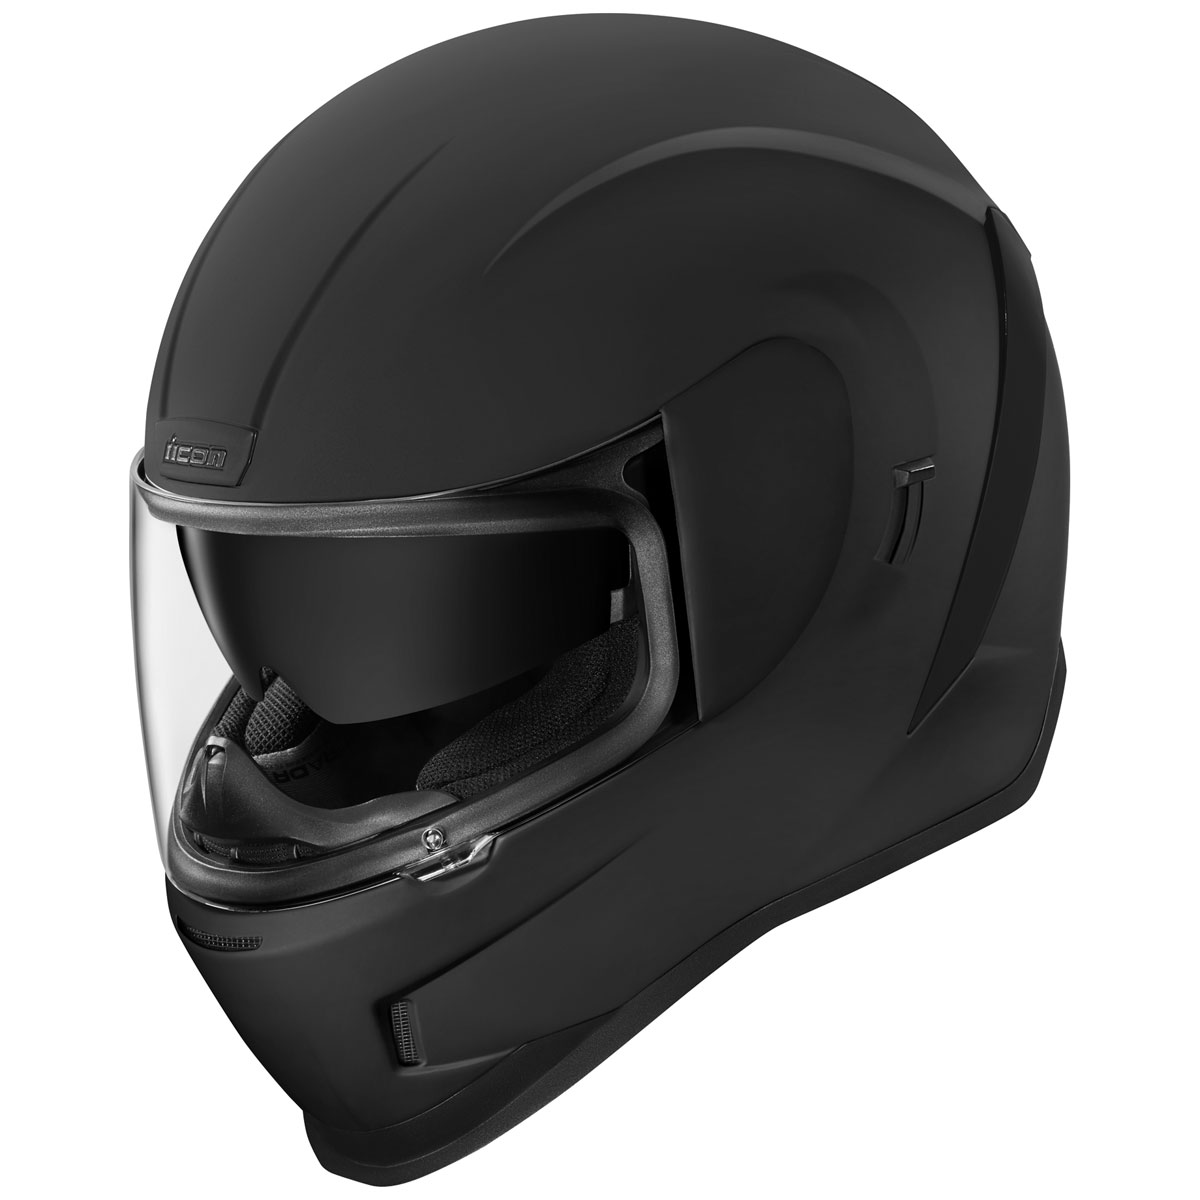 ICON Airform Rubatone Black Full Face Helmet